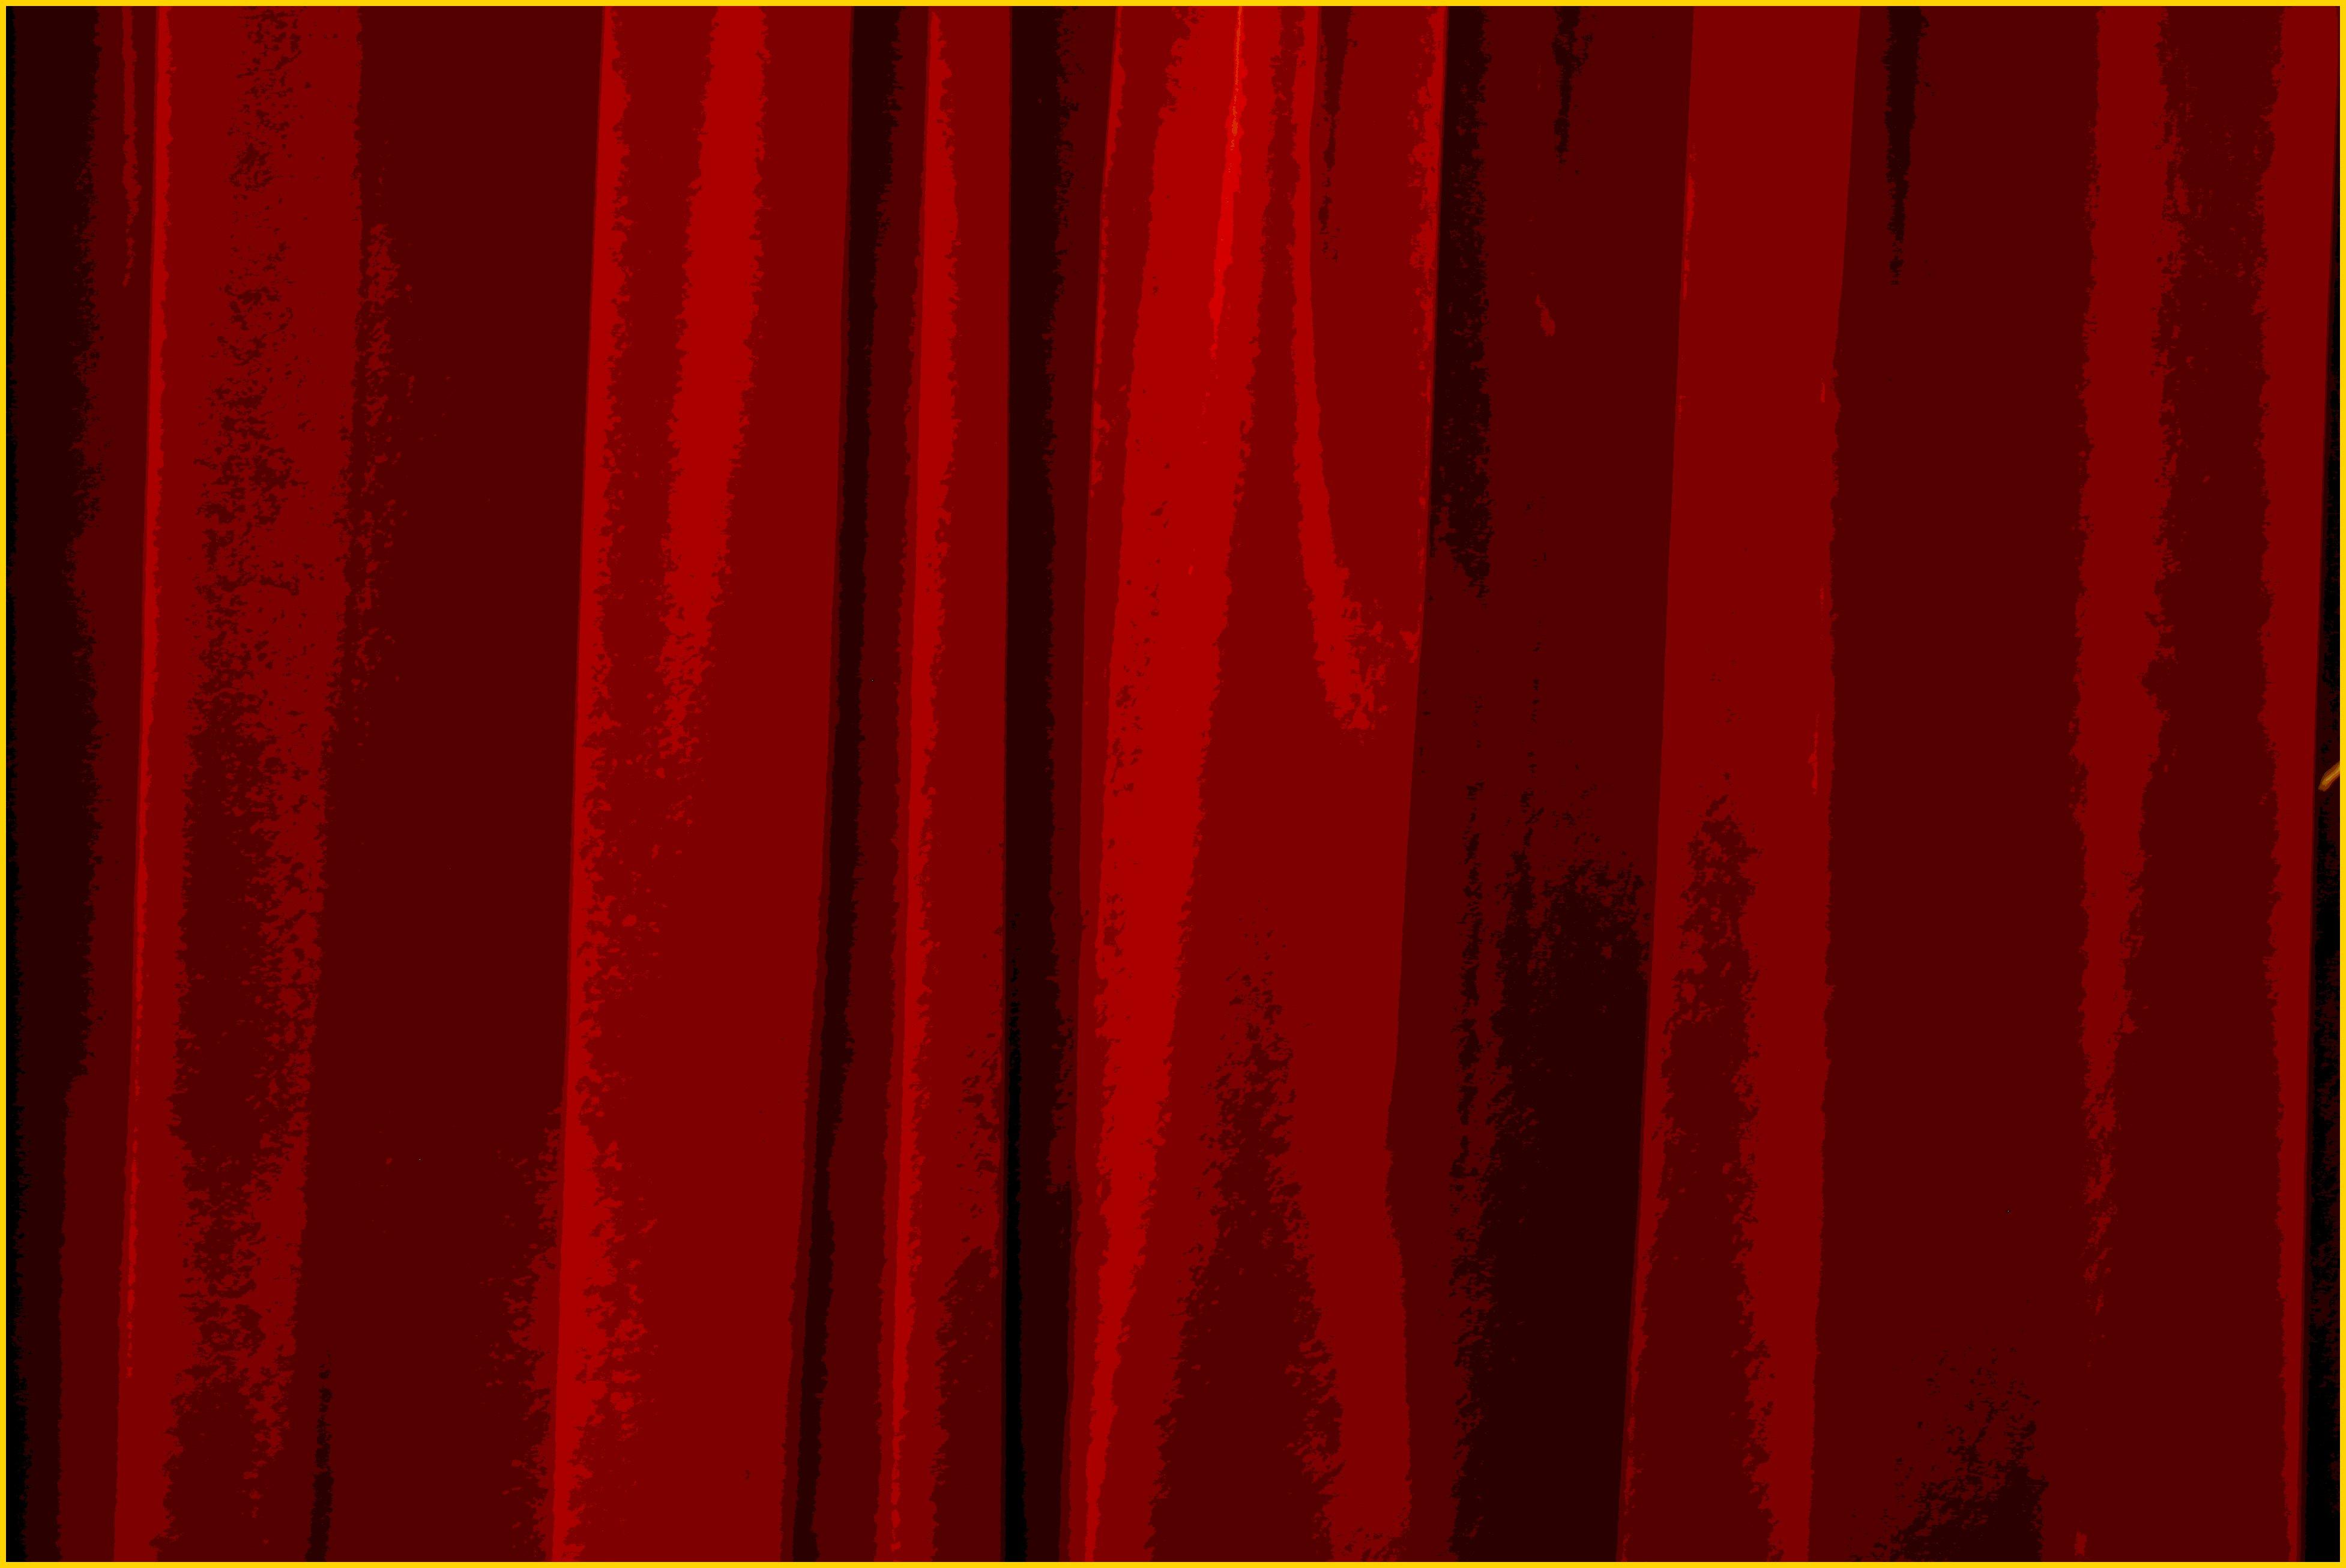 Red Curtains Christina James Crime Novelist